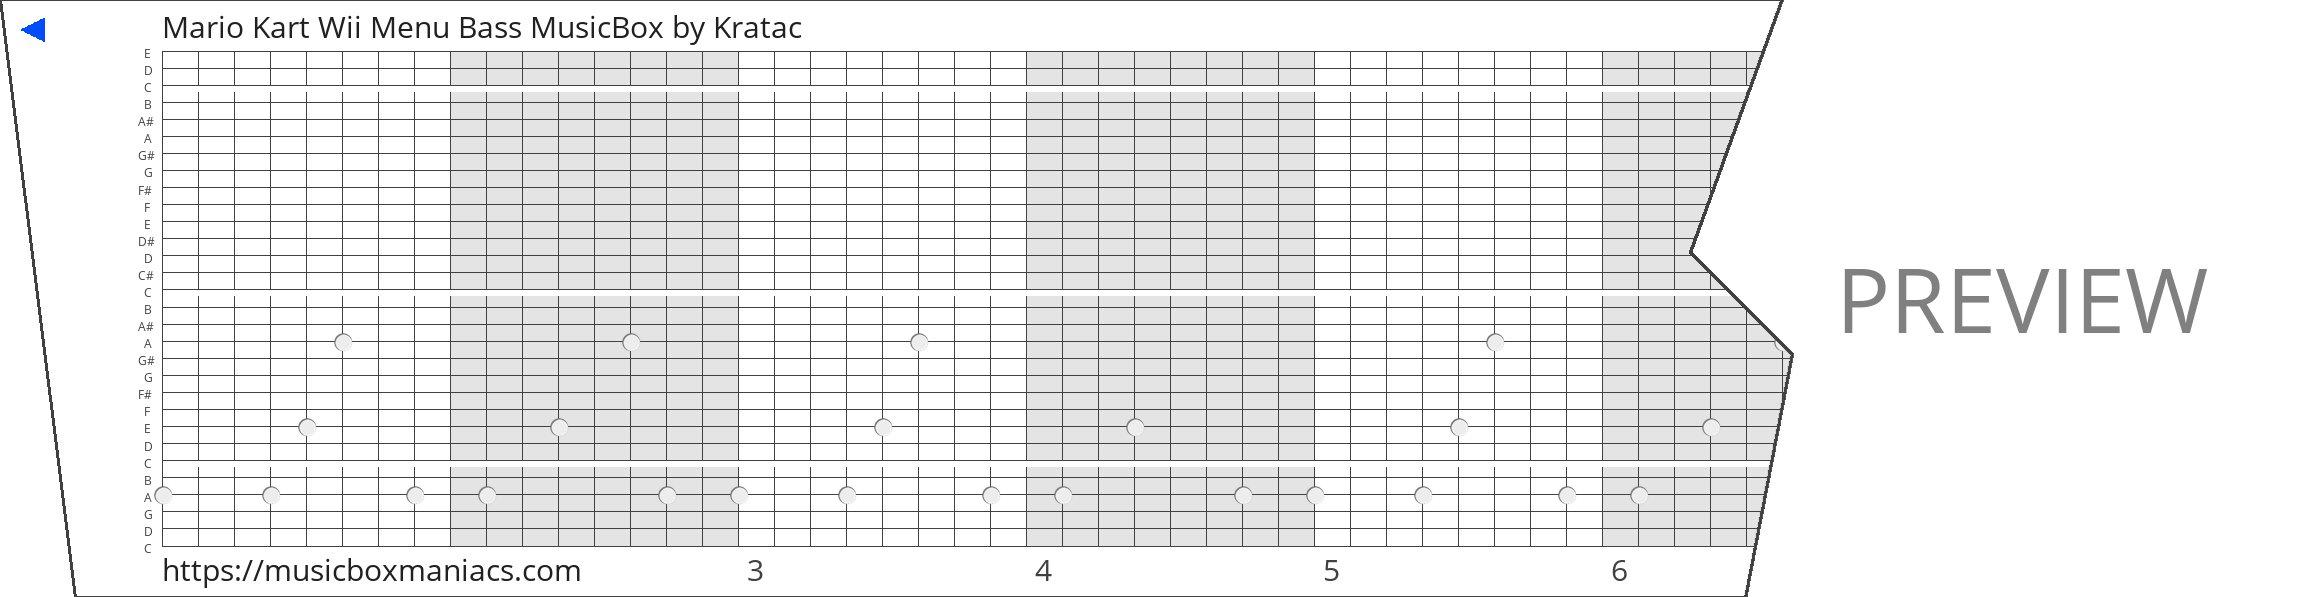 Mario Kart Wii Menu Bass MusicBox 30 note music box paper strip